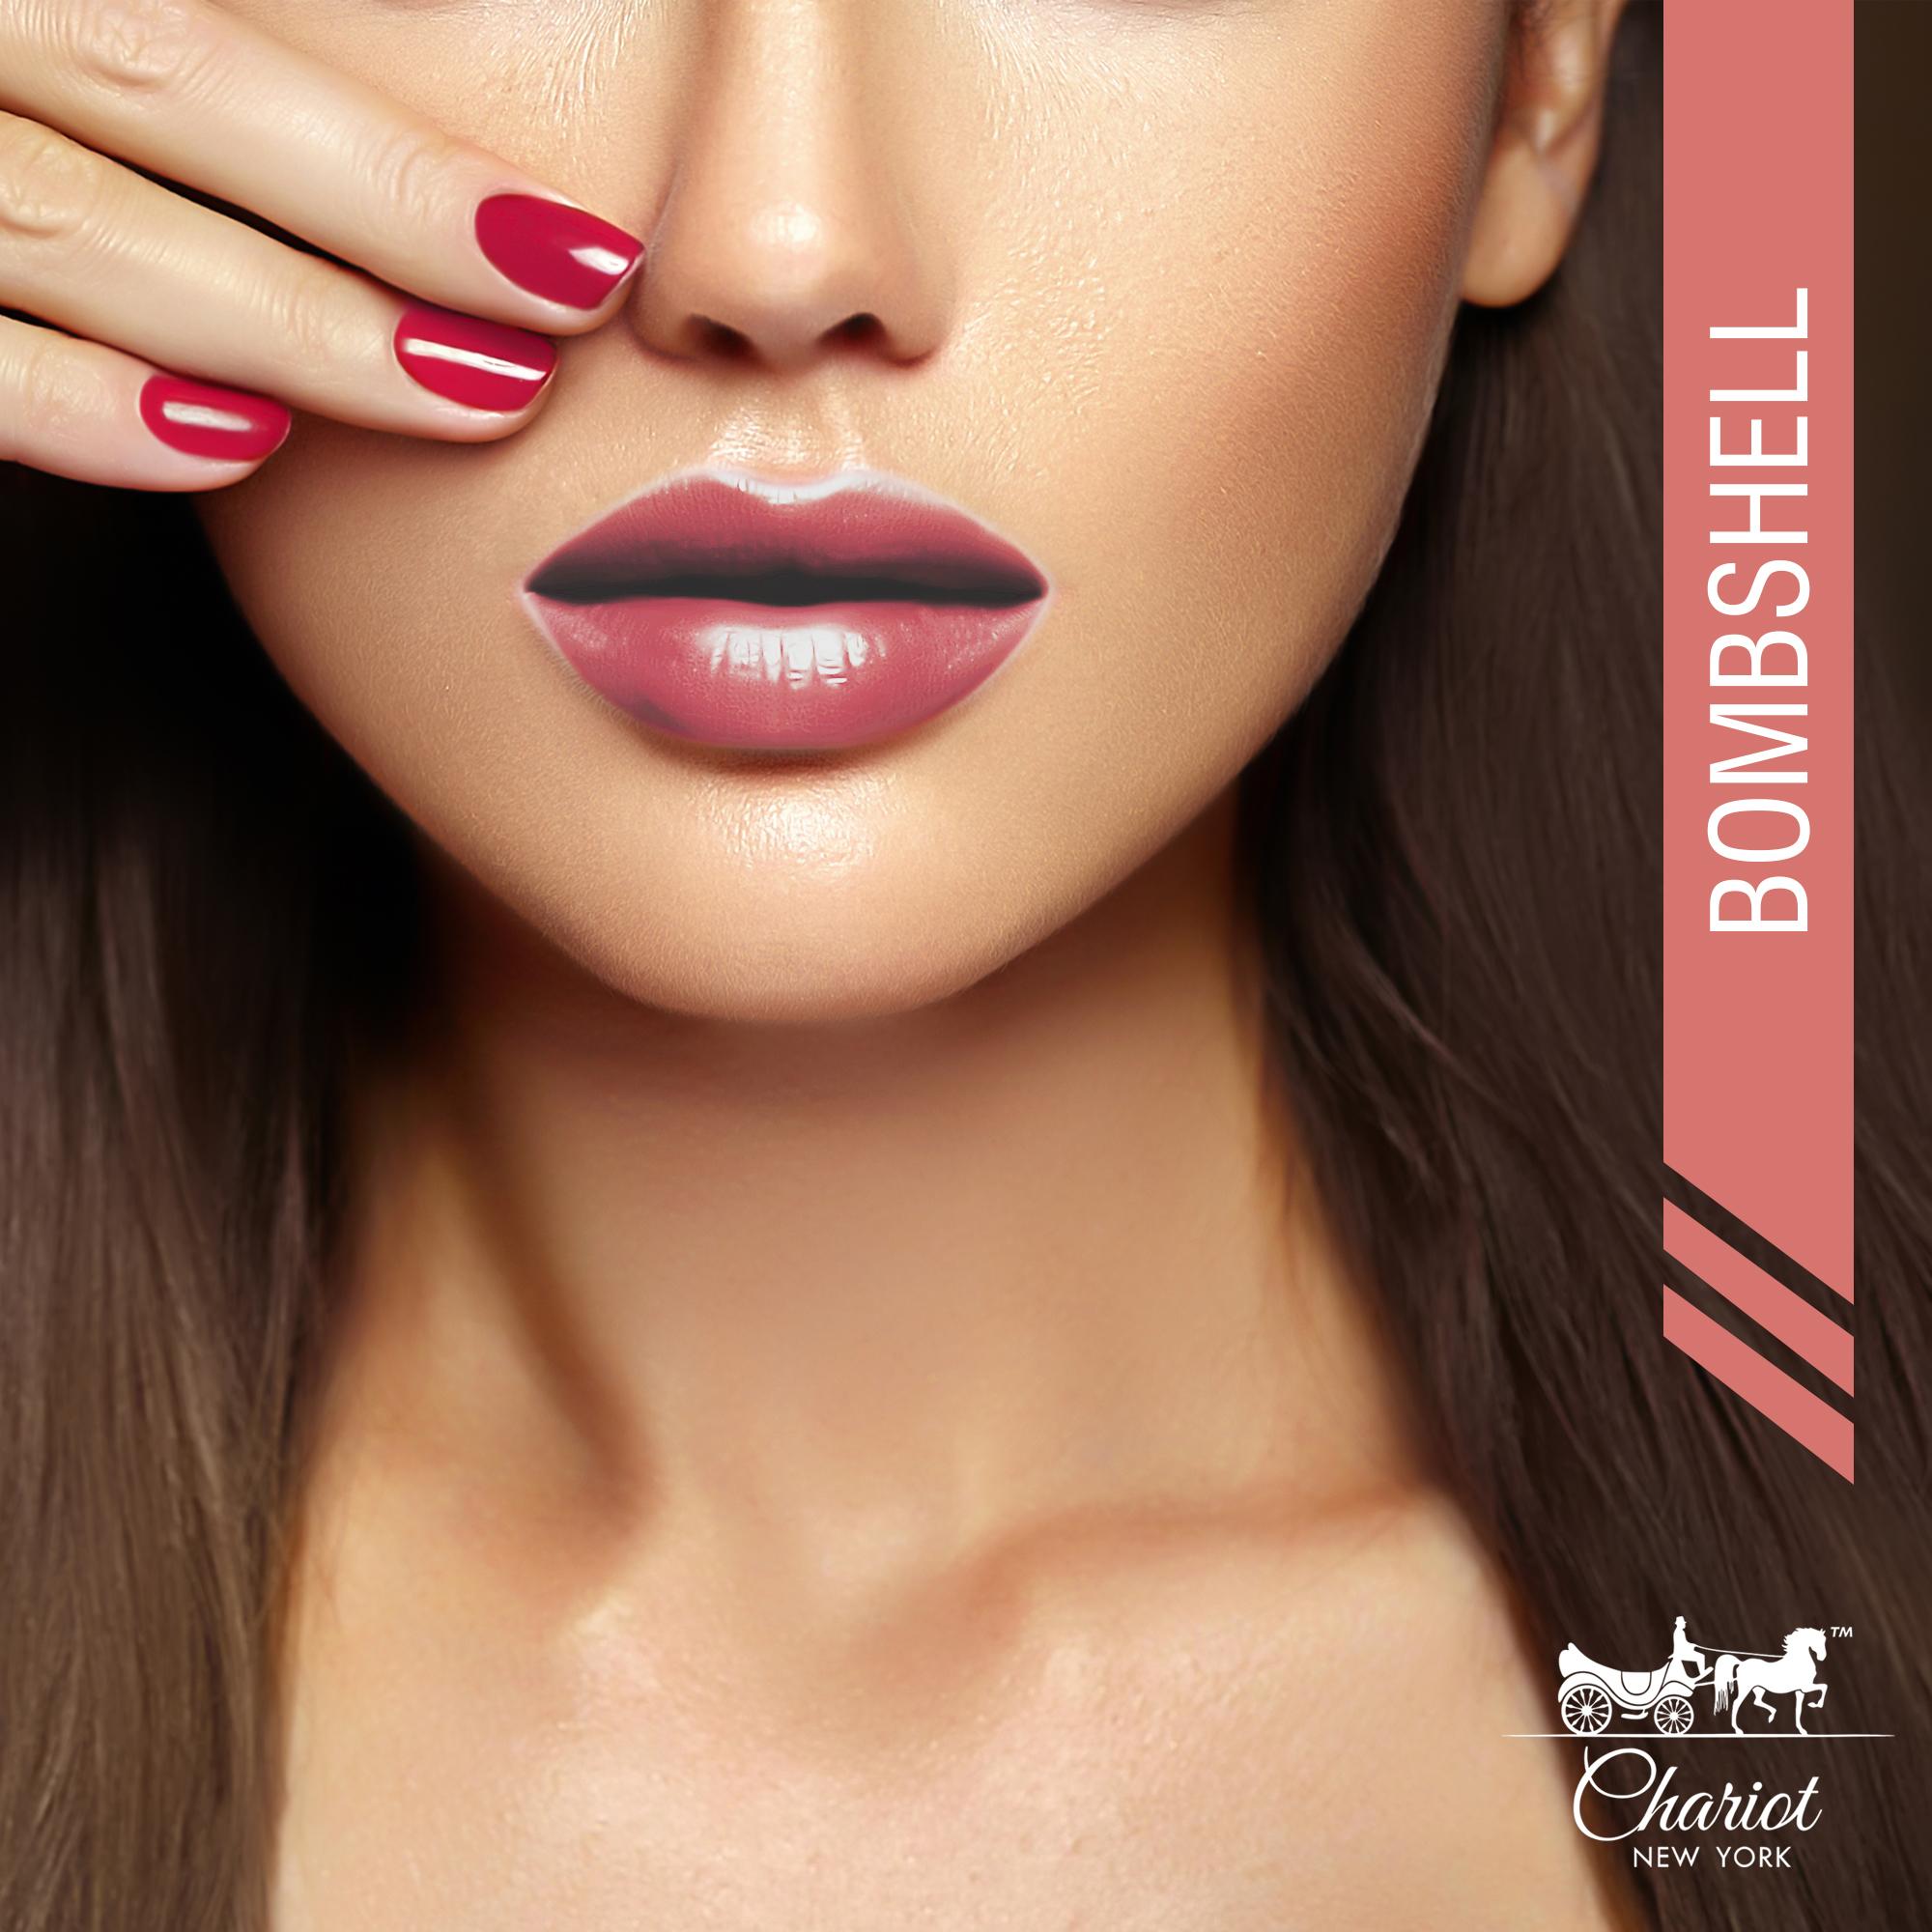 Chariot New York Bombshell Lipstick (Strawberry Pink)